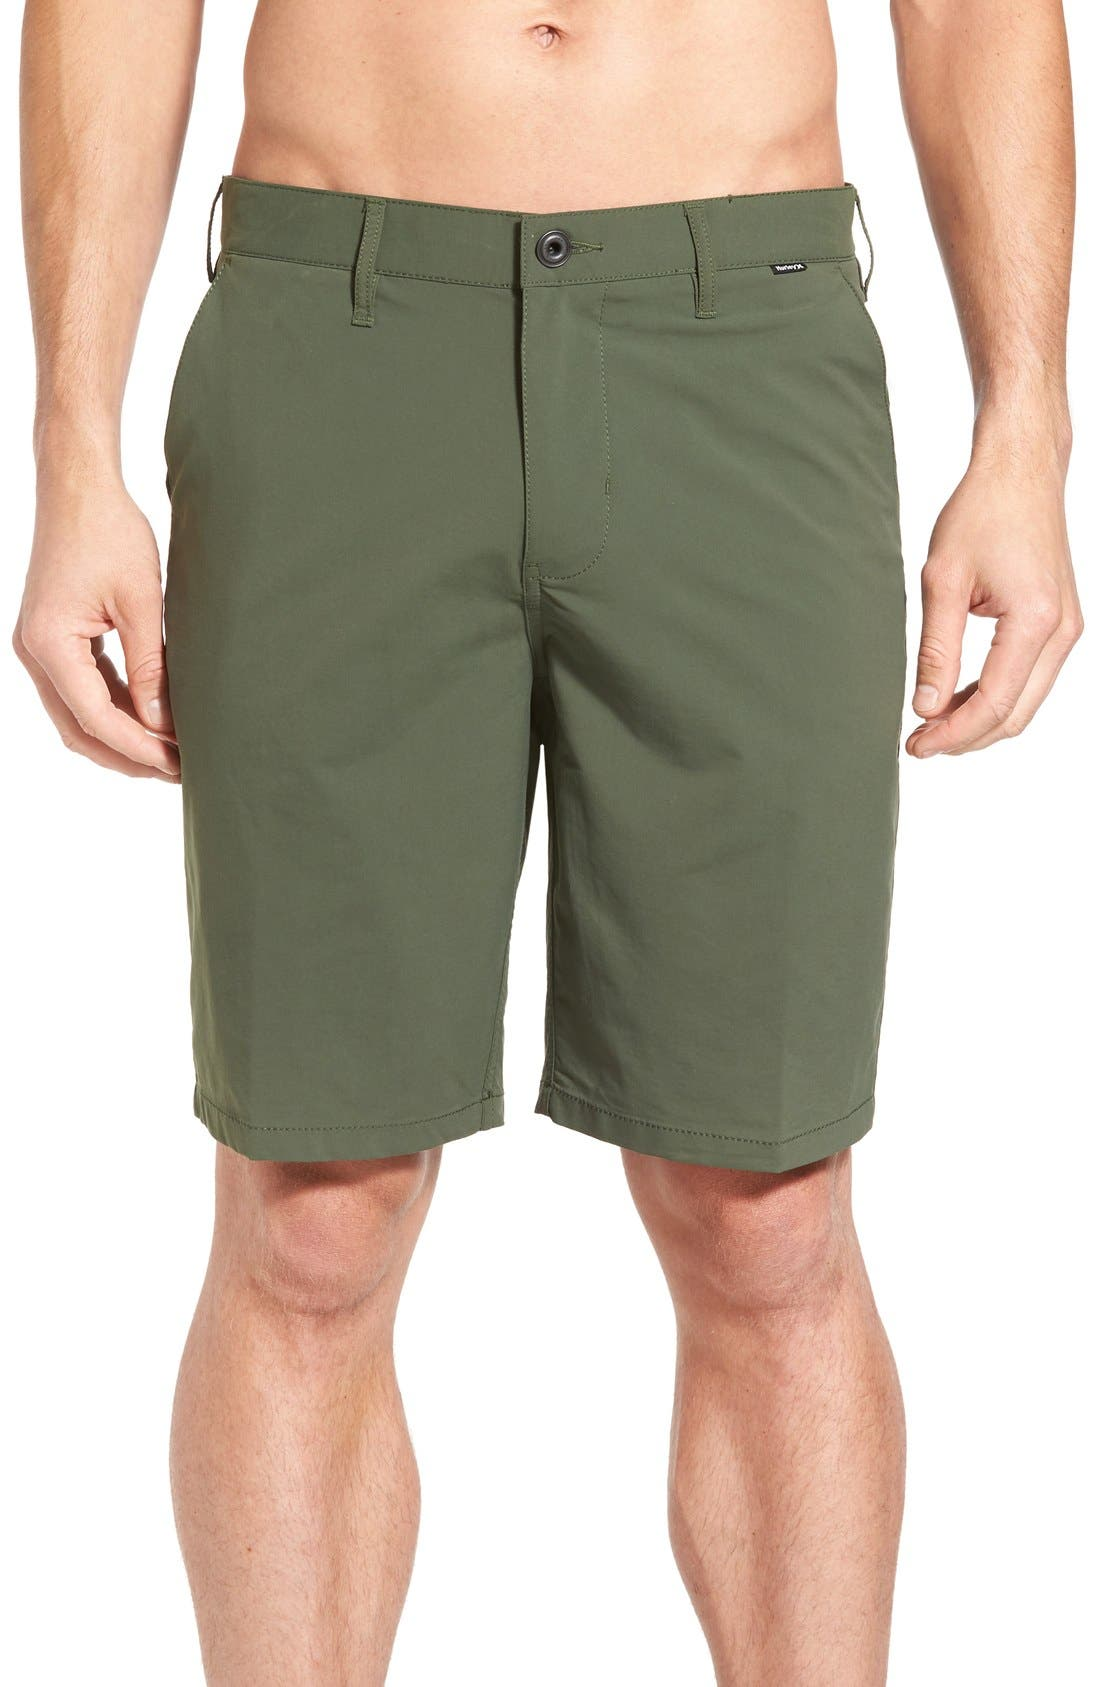 'Dry Out' Dri-FIT<sup>™</sup> Chino Shorts,                             Main thumbnail 27, color,